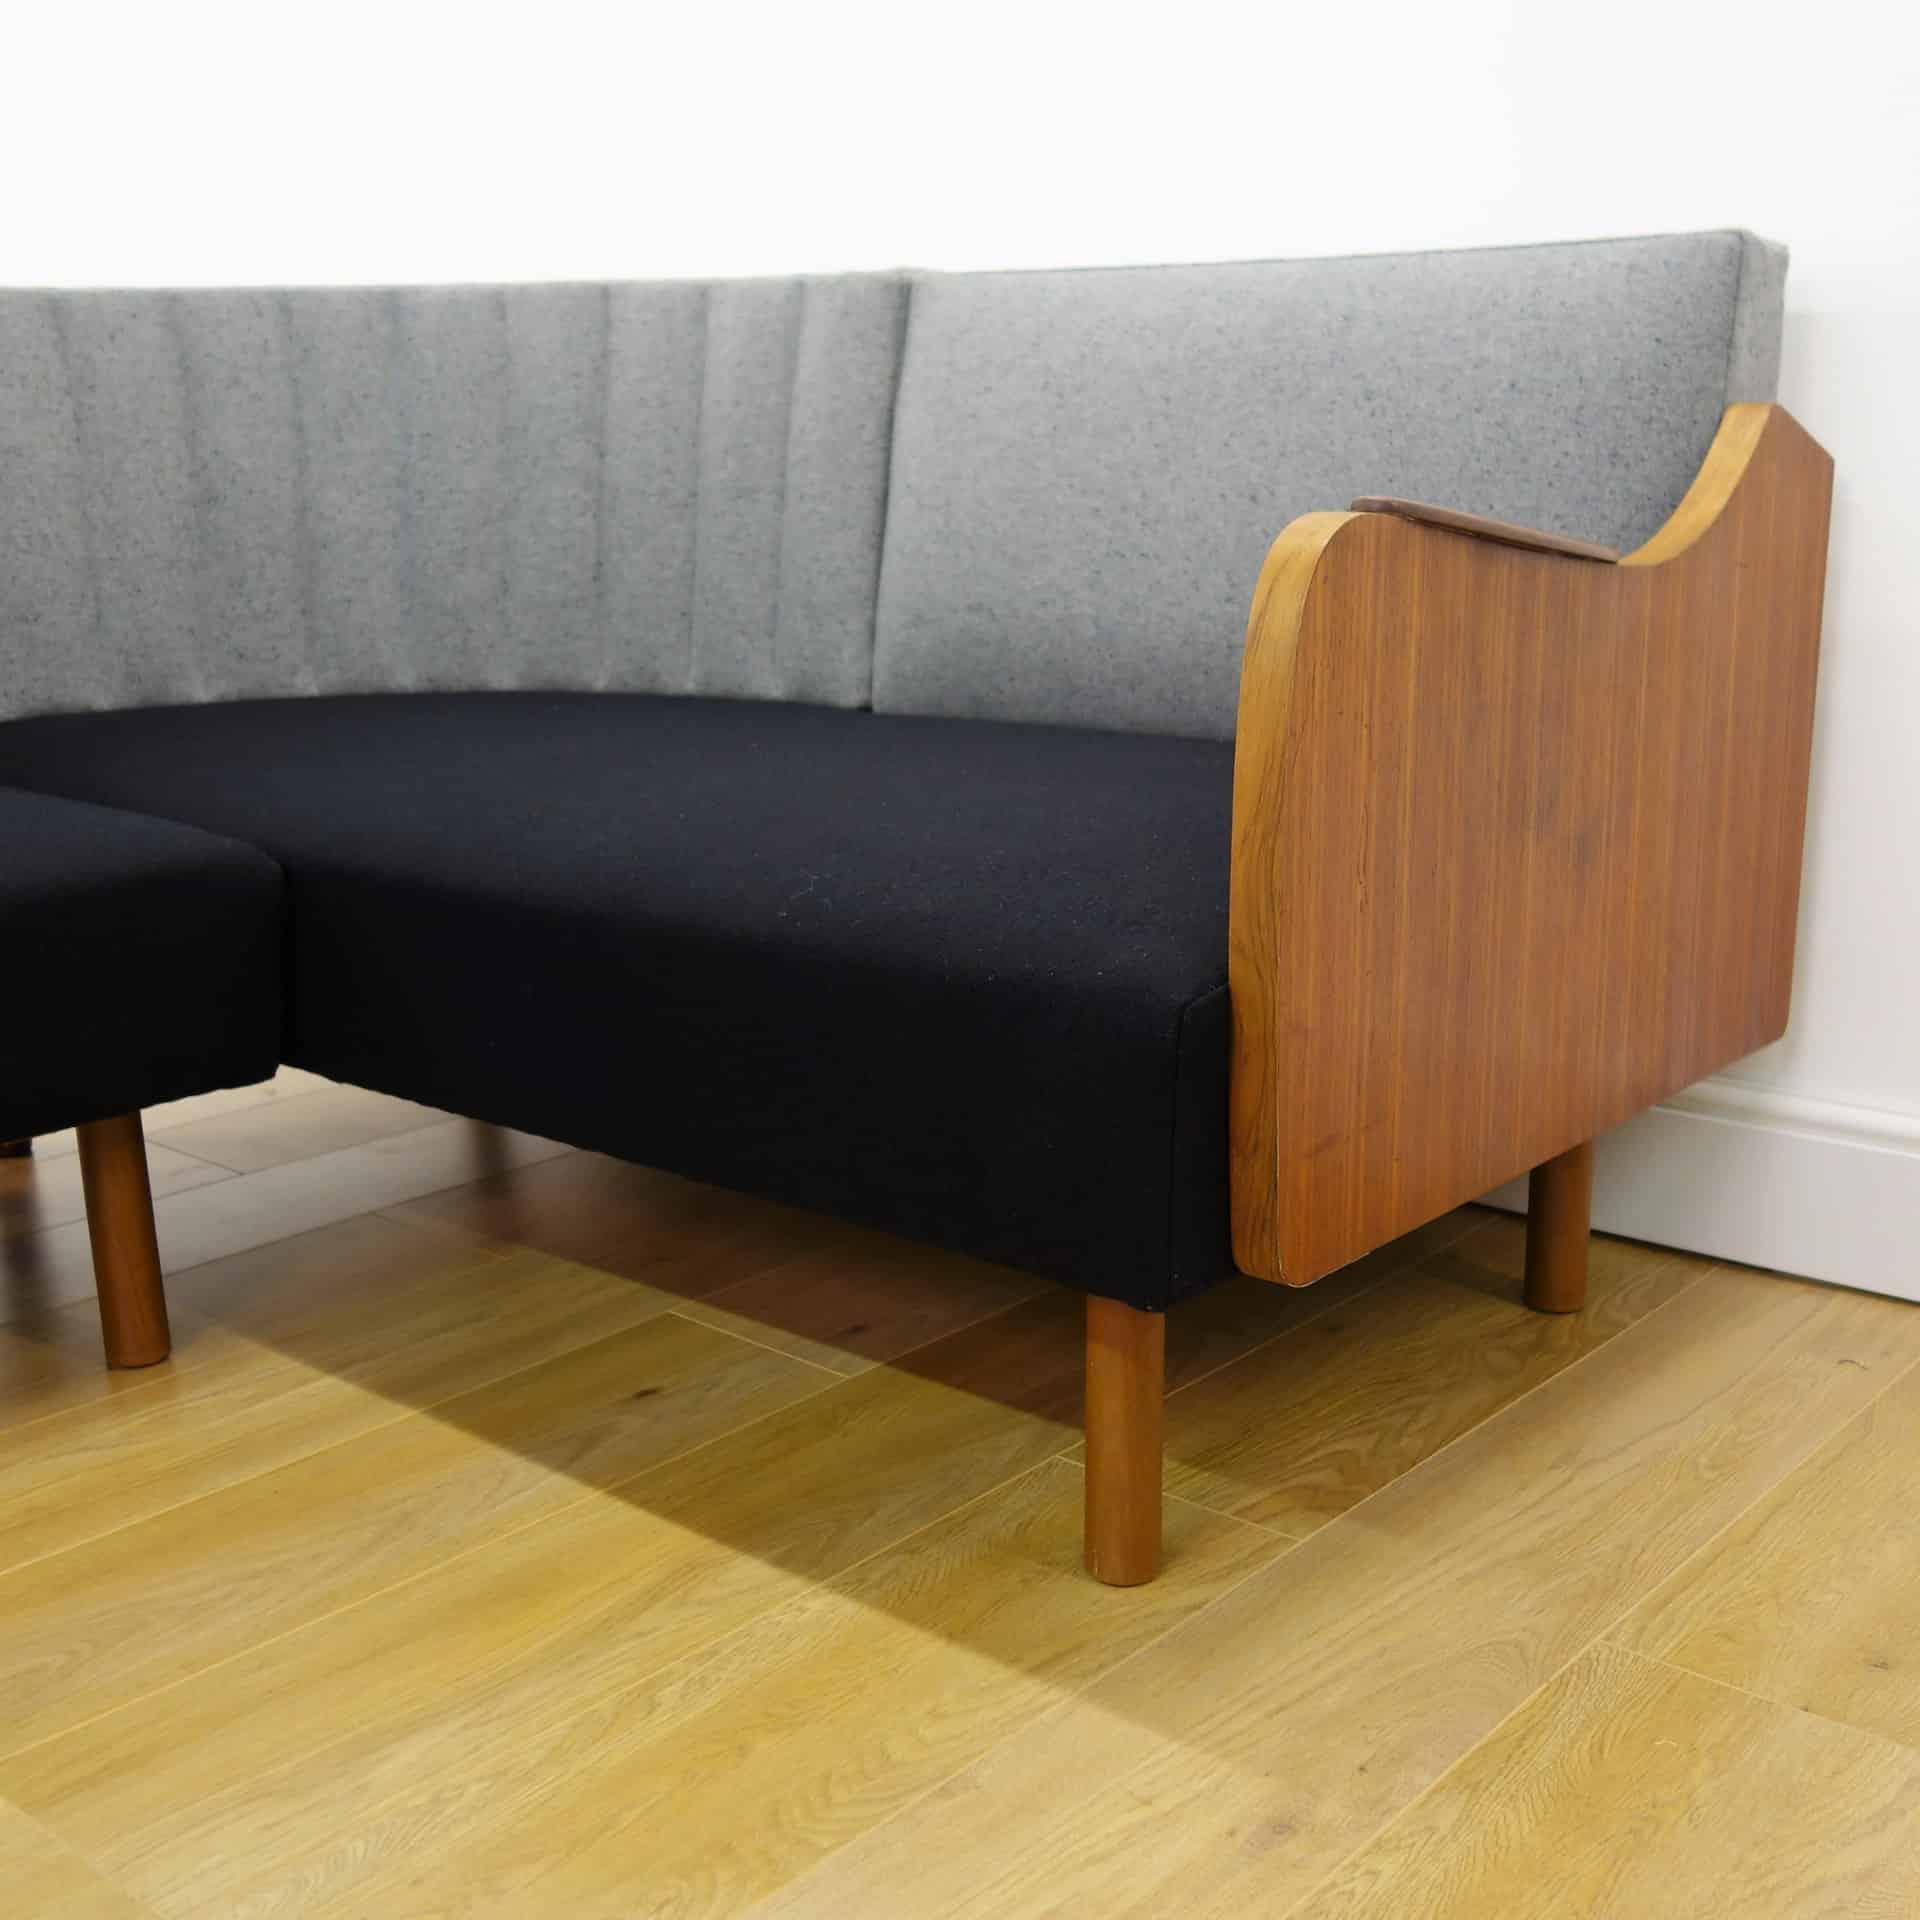 danish style sofa bed uk set cushion covers 1960s teak corner day mark parrish mid